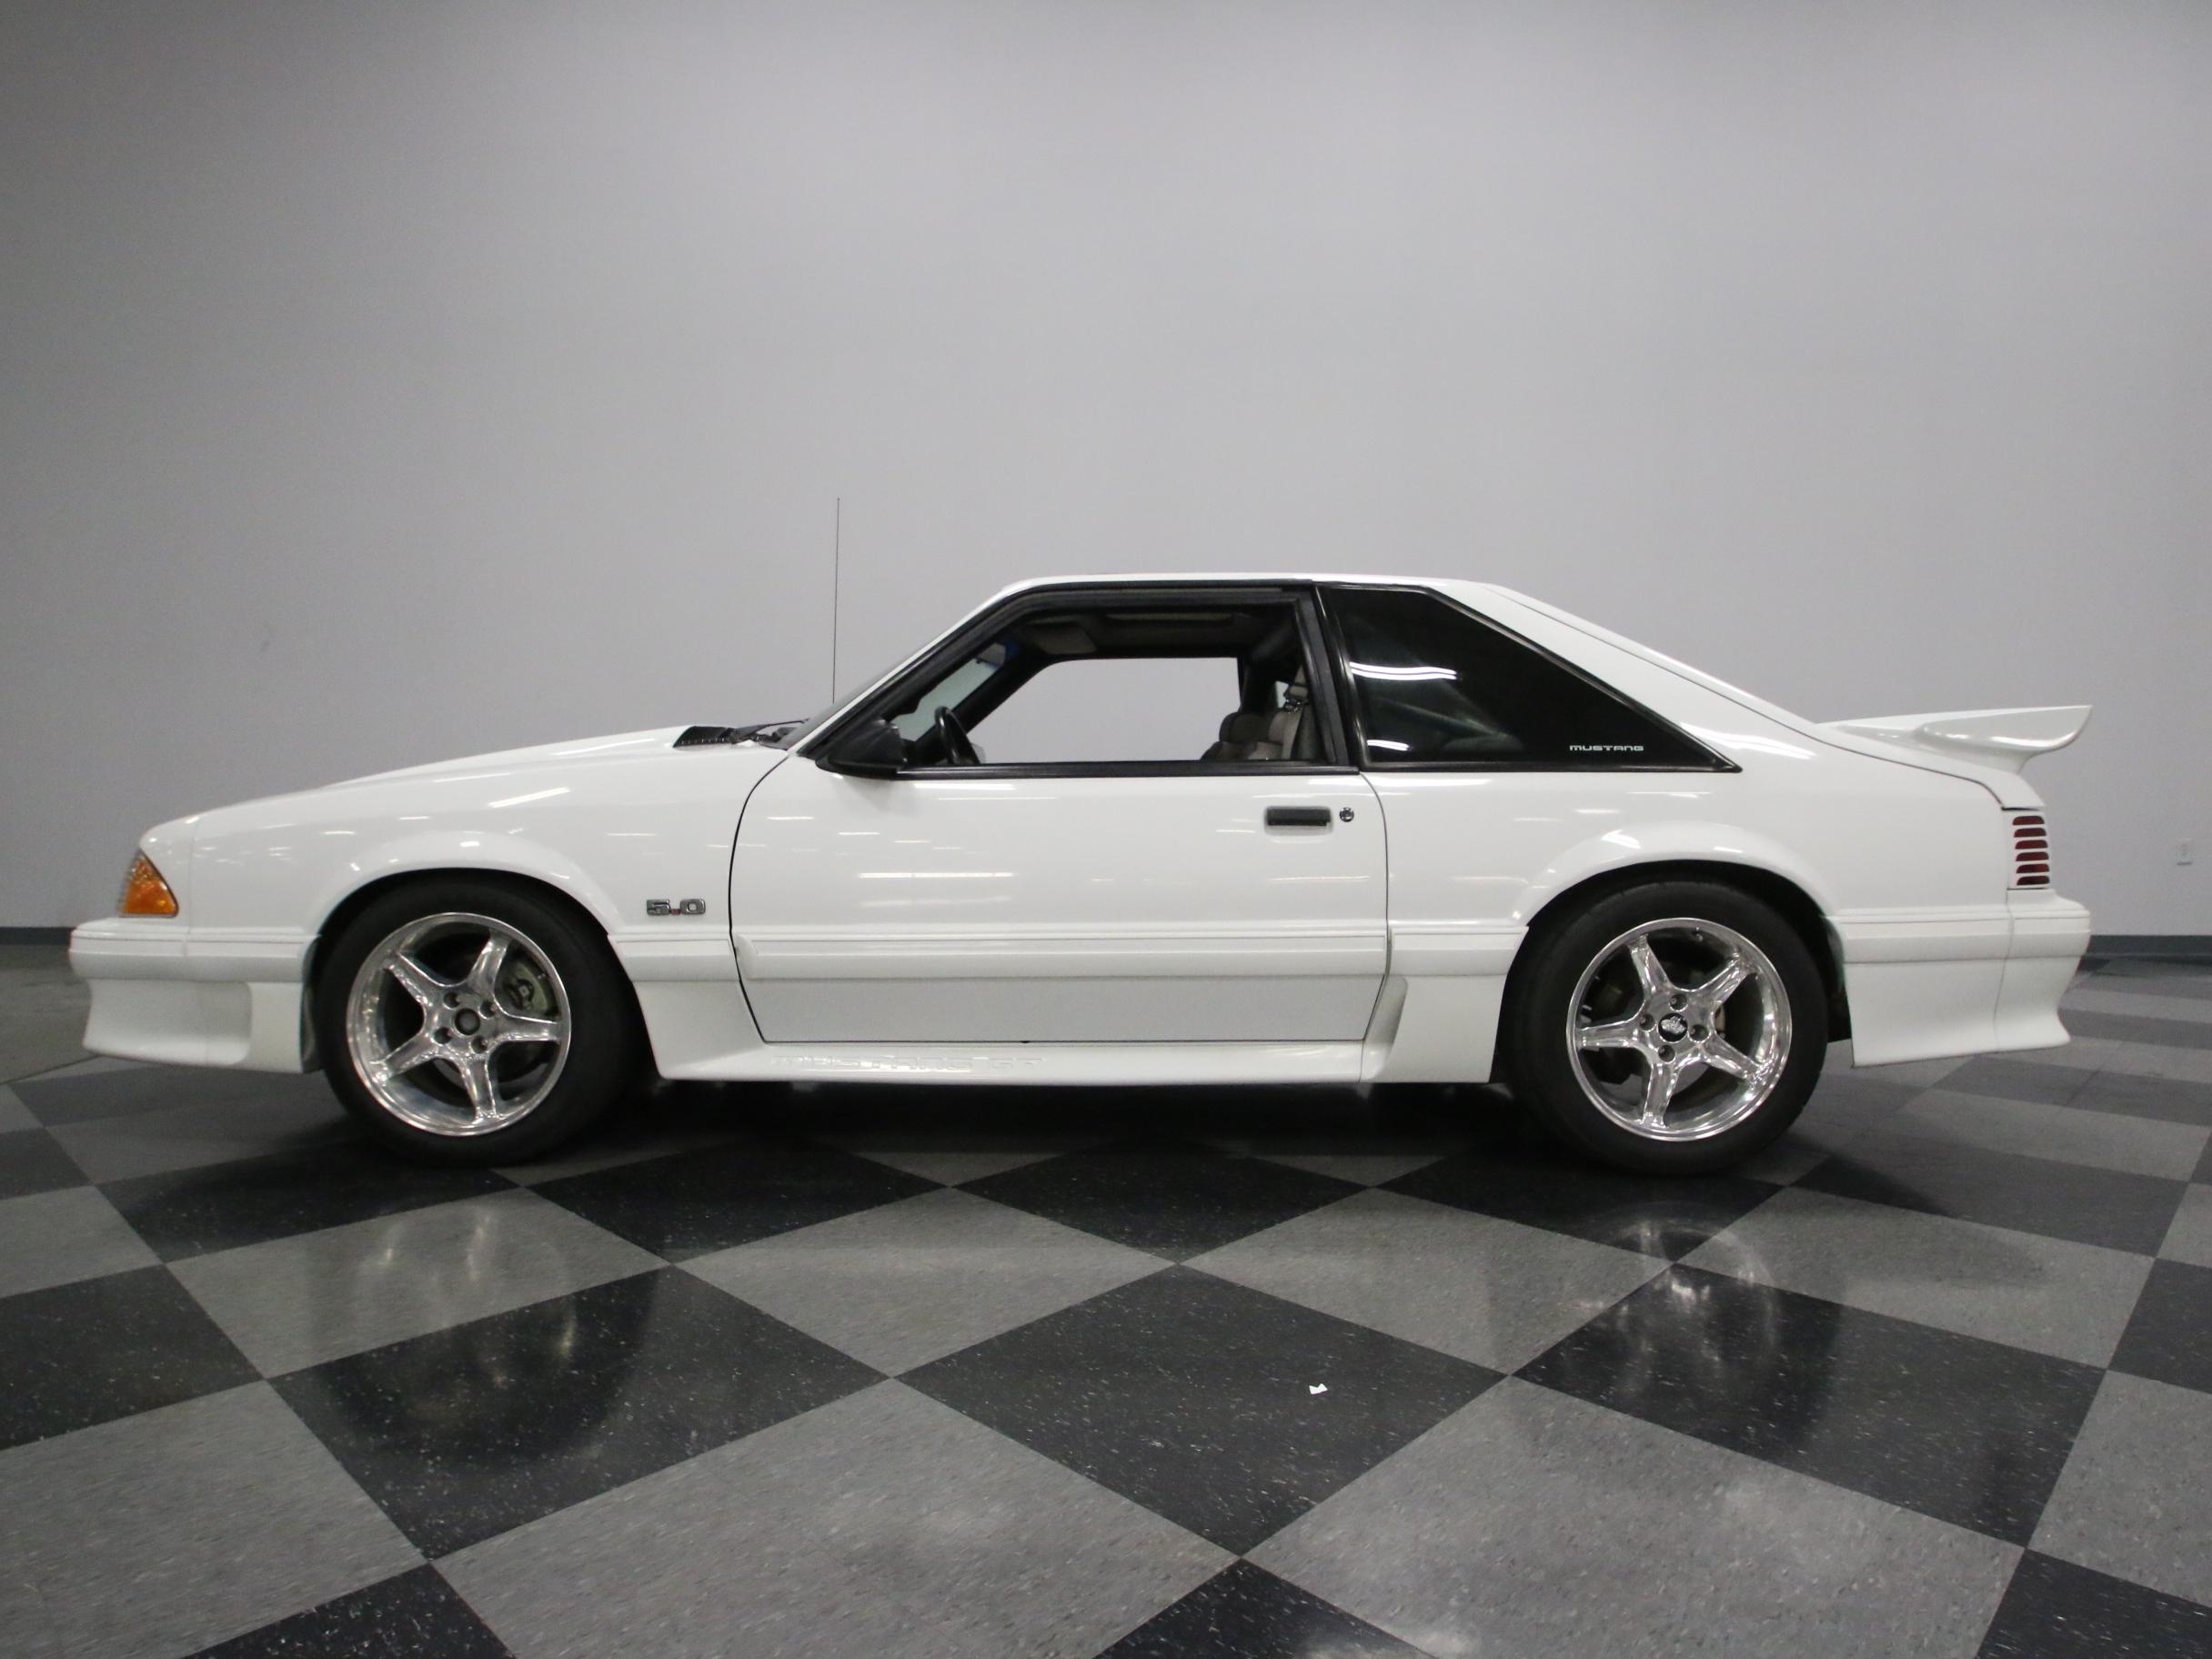 0671-NSH   1990 Ford Mustang GT   Streetside Classics